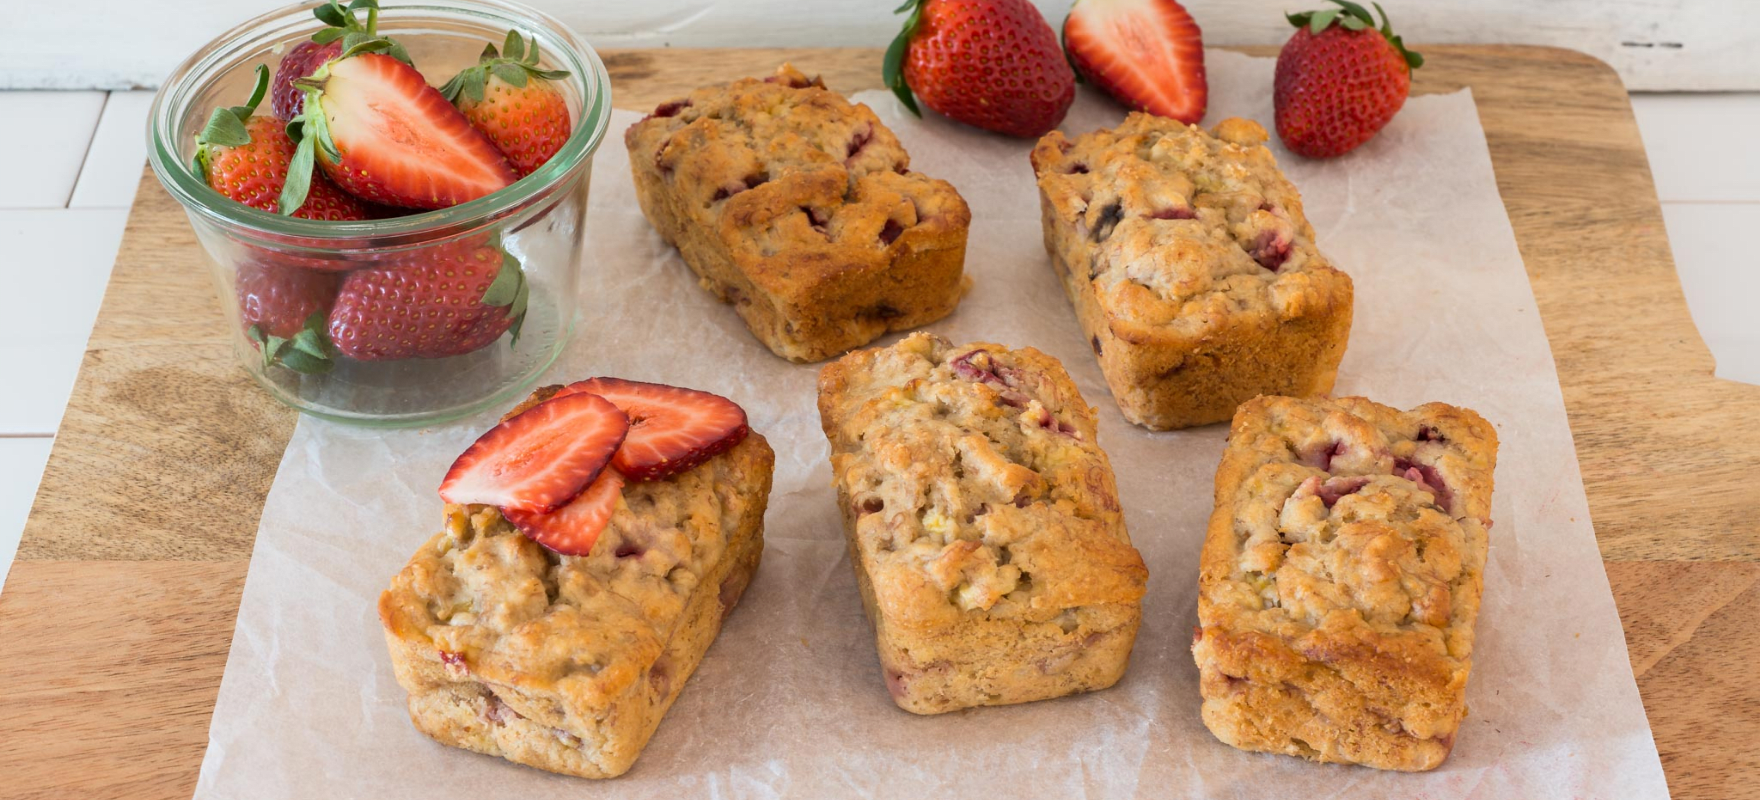 Mini banana and strawberry loaves image 1